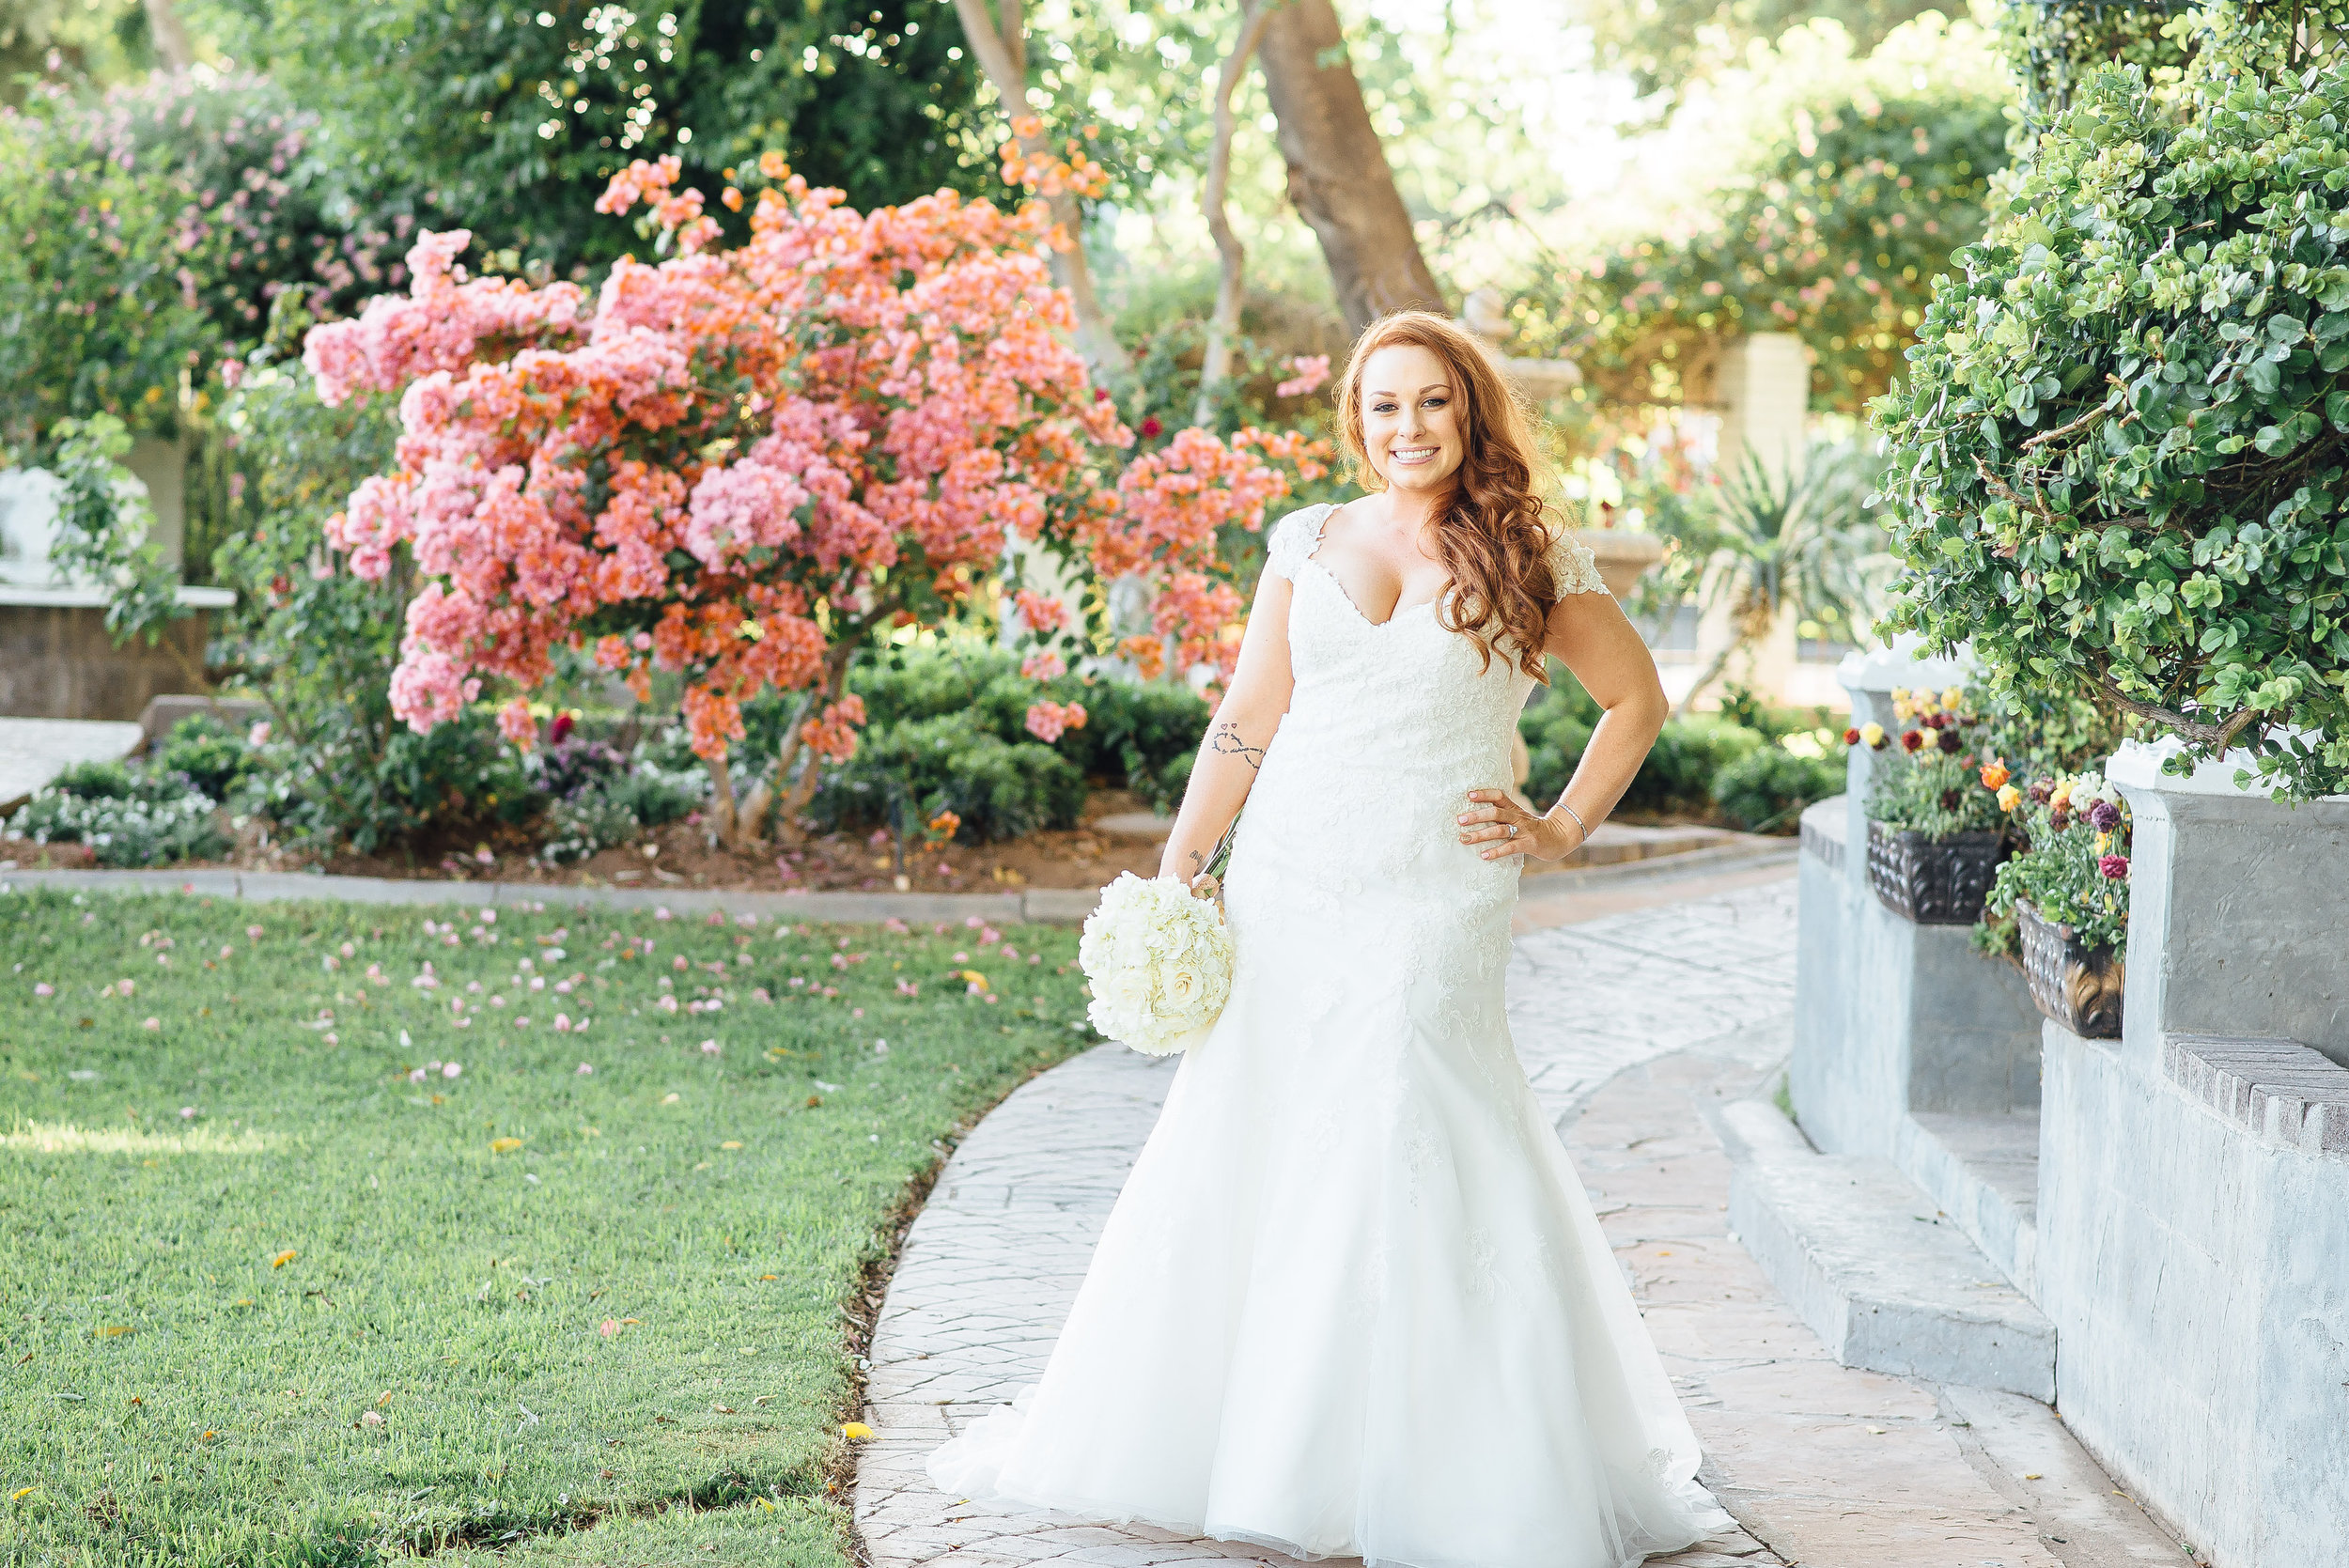 bridalparty-23-3.jpg